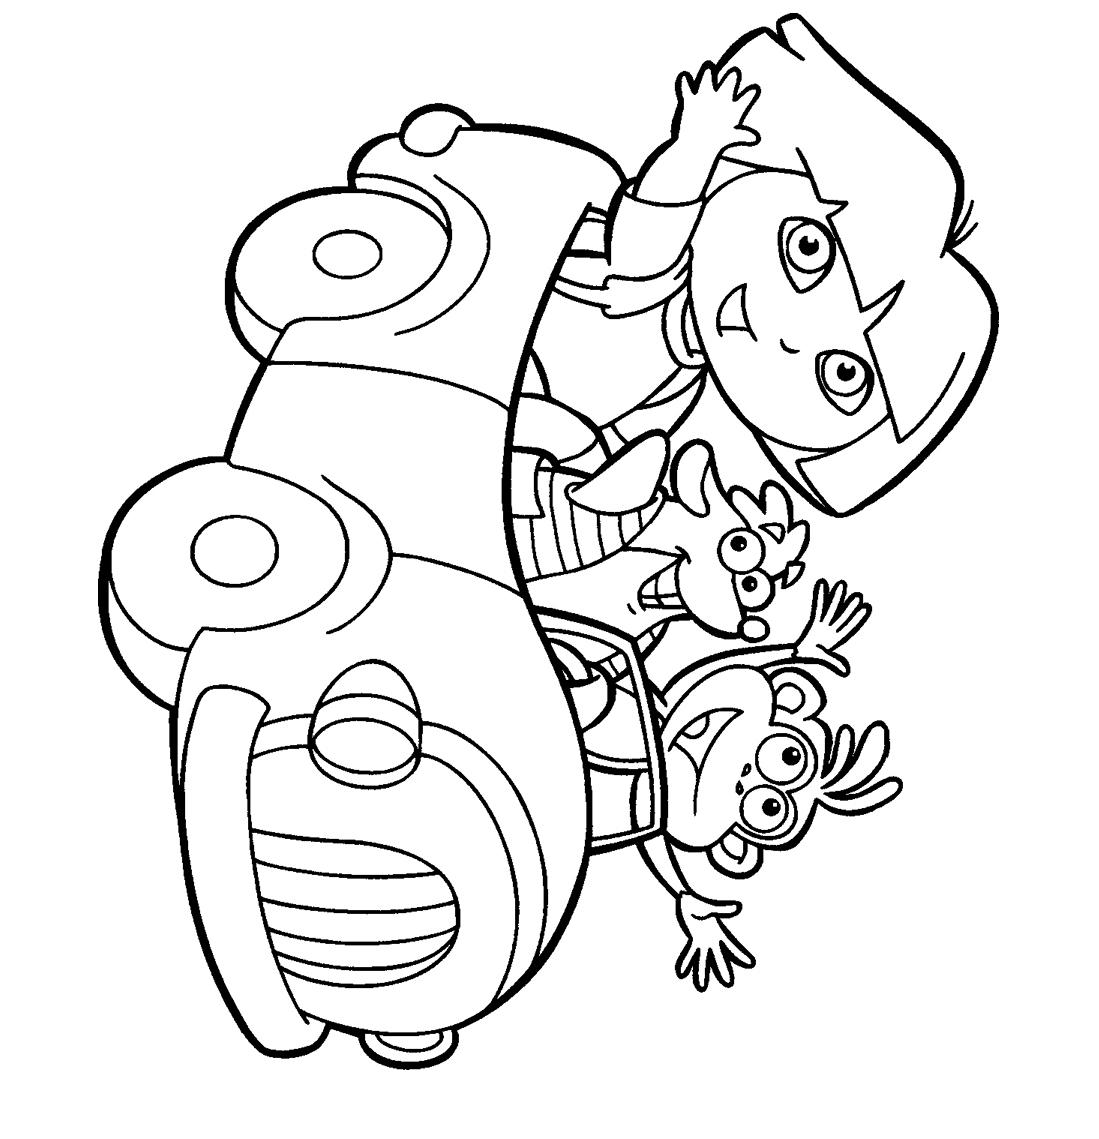 Coloriage Dora A Faire En Ligne. Dora_Coloriage_03. Dora destiné Coloriage Dora Princesse